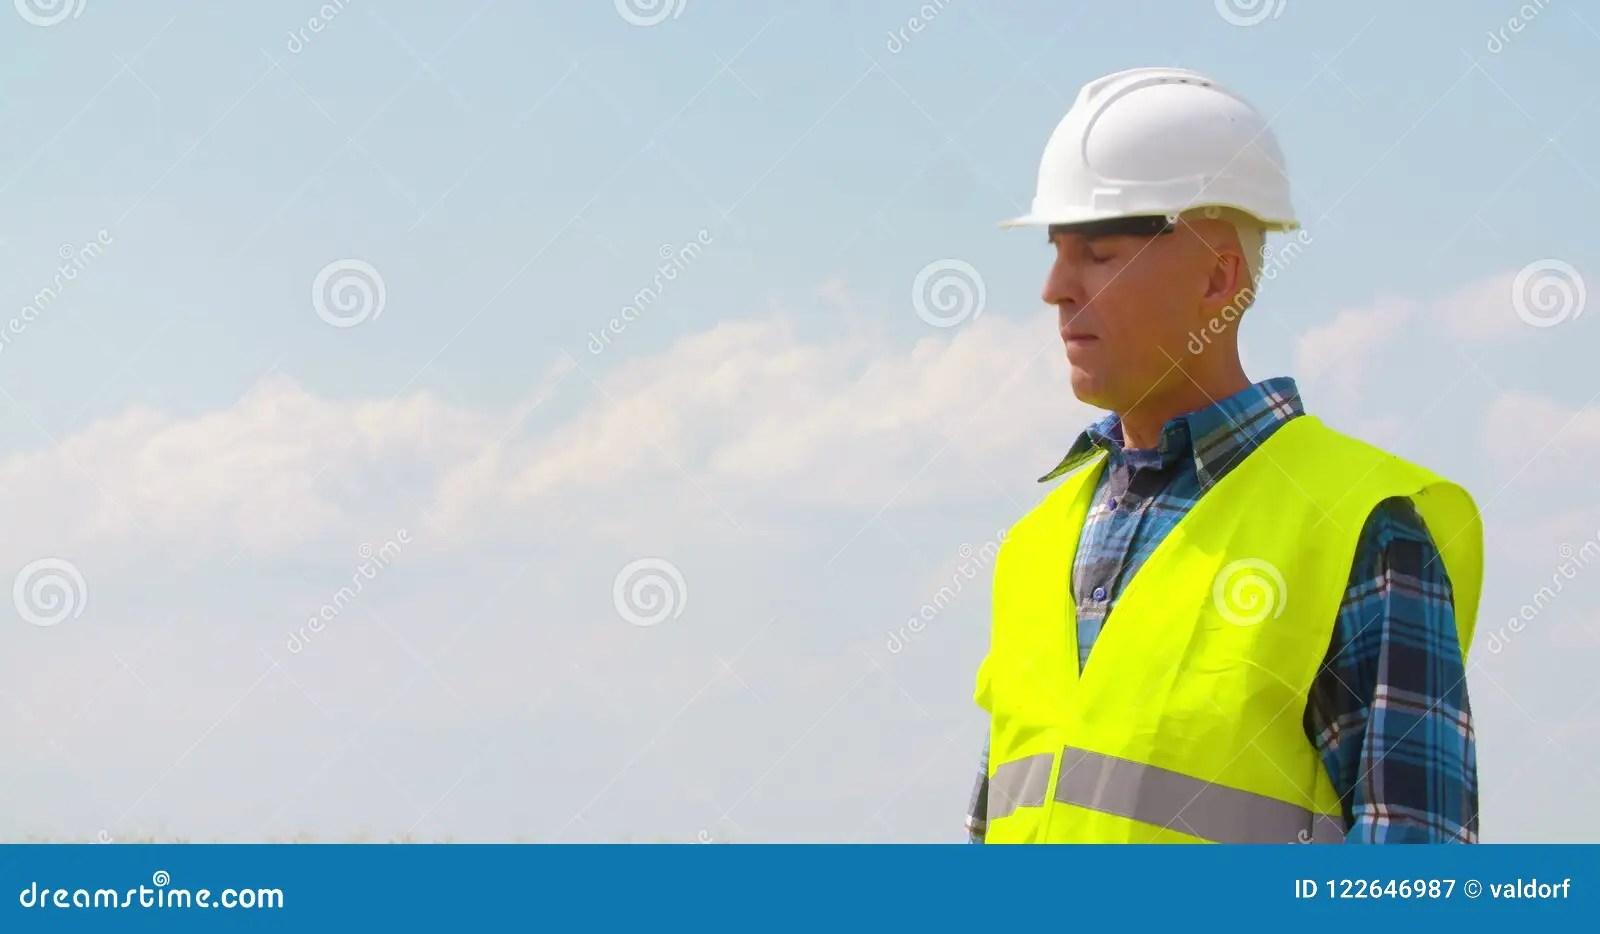 Engineer Reading BluePrint And Working On Alternative Energy